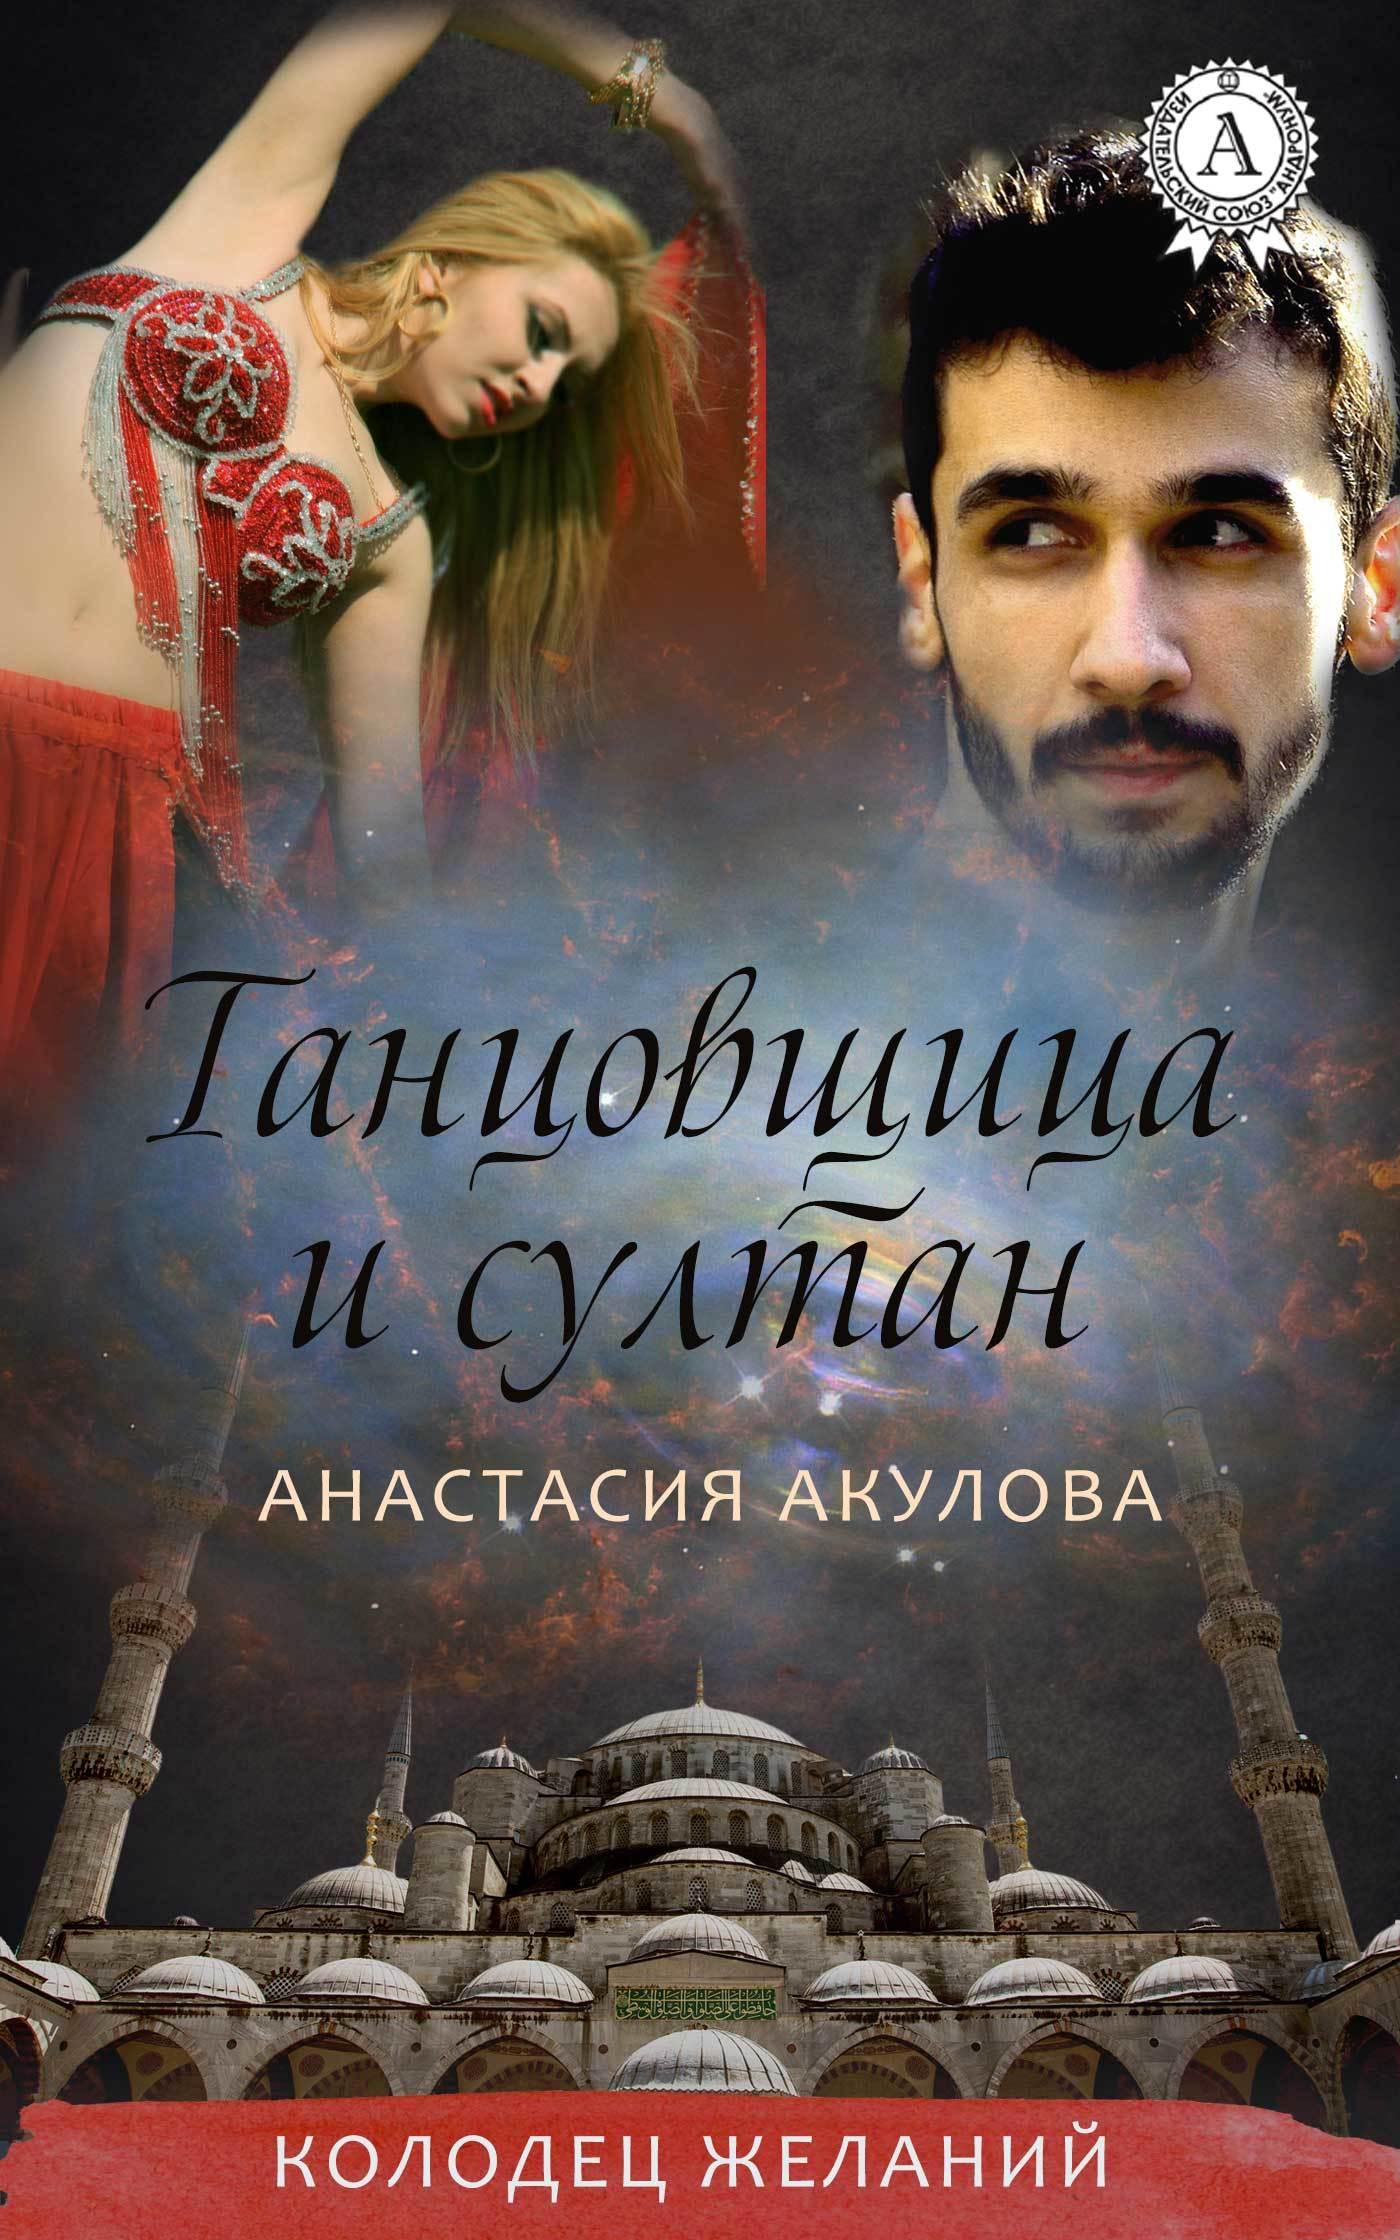 Анастасия Акулова. Танцовщица и султан